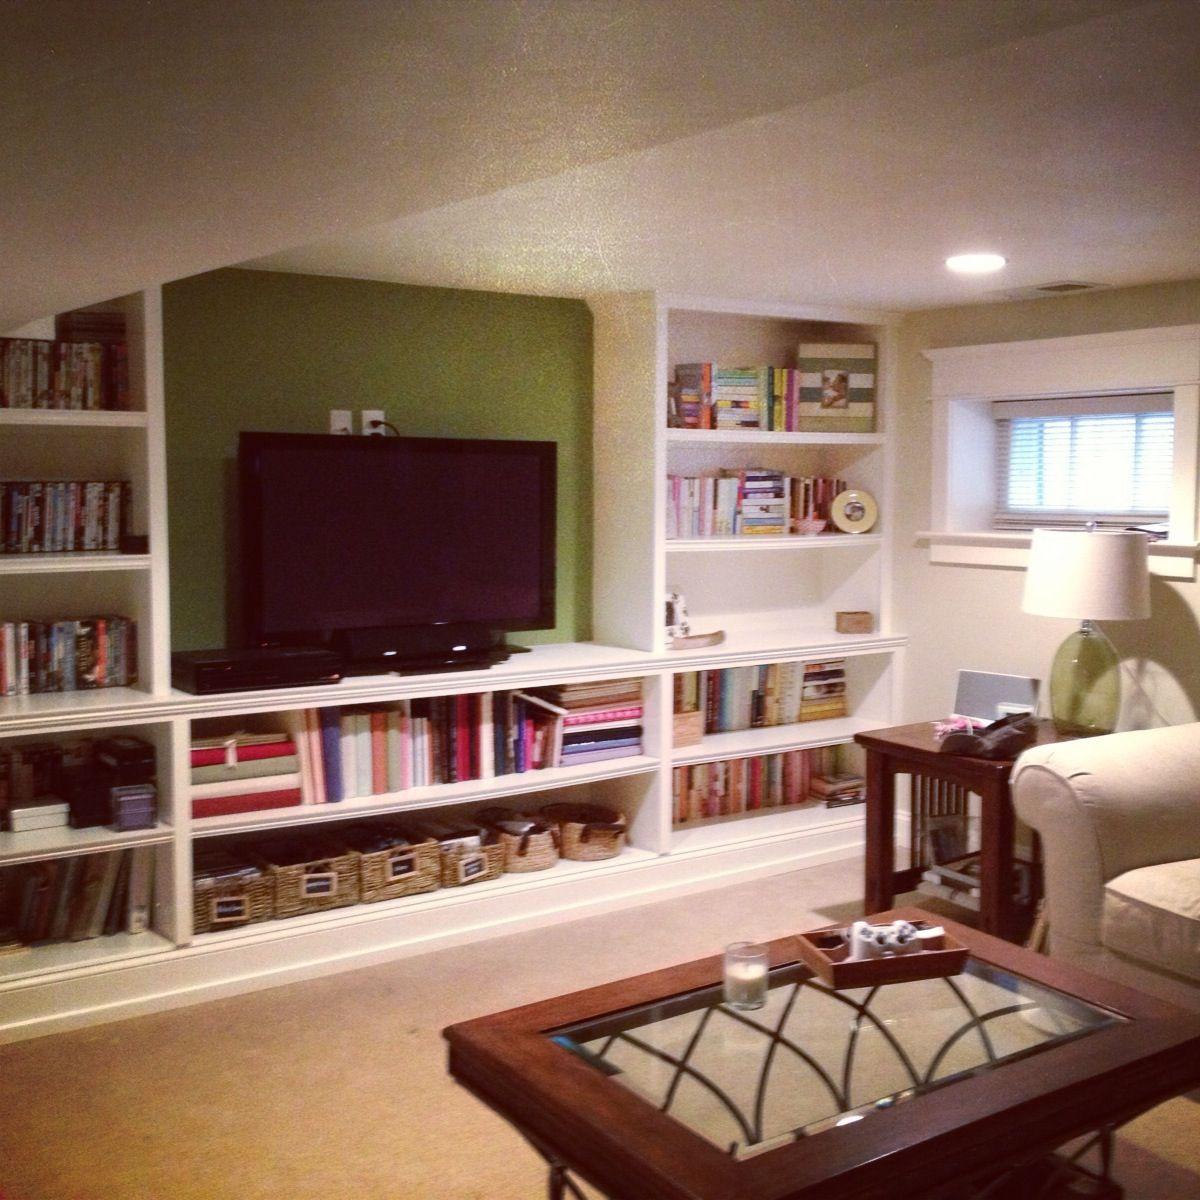 Tv Room Ideas: Basement. Rec Room. Tv Room. Built In Shelves.